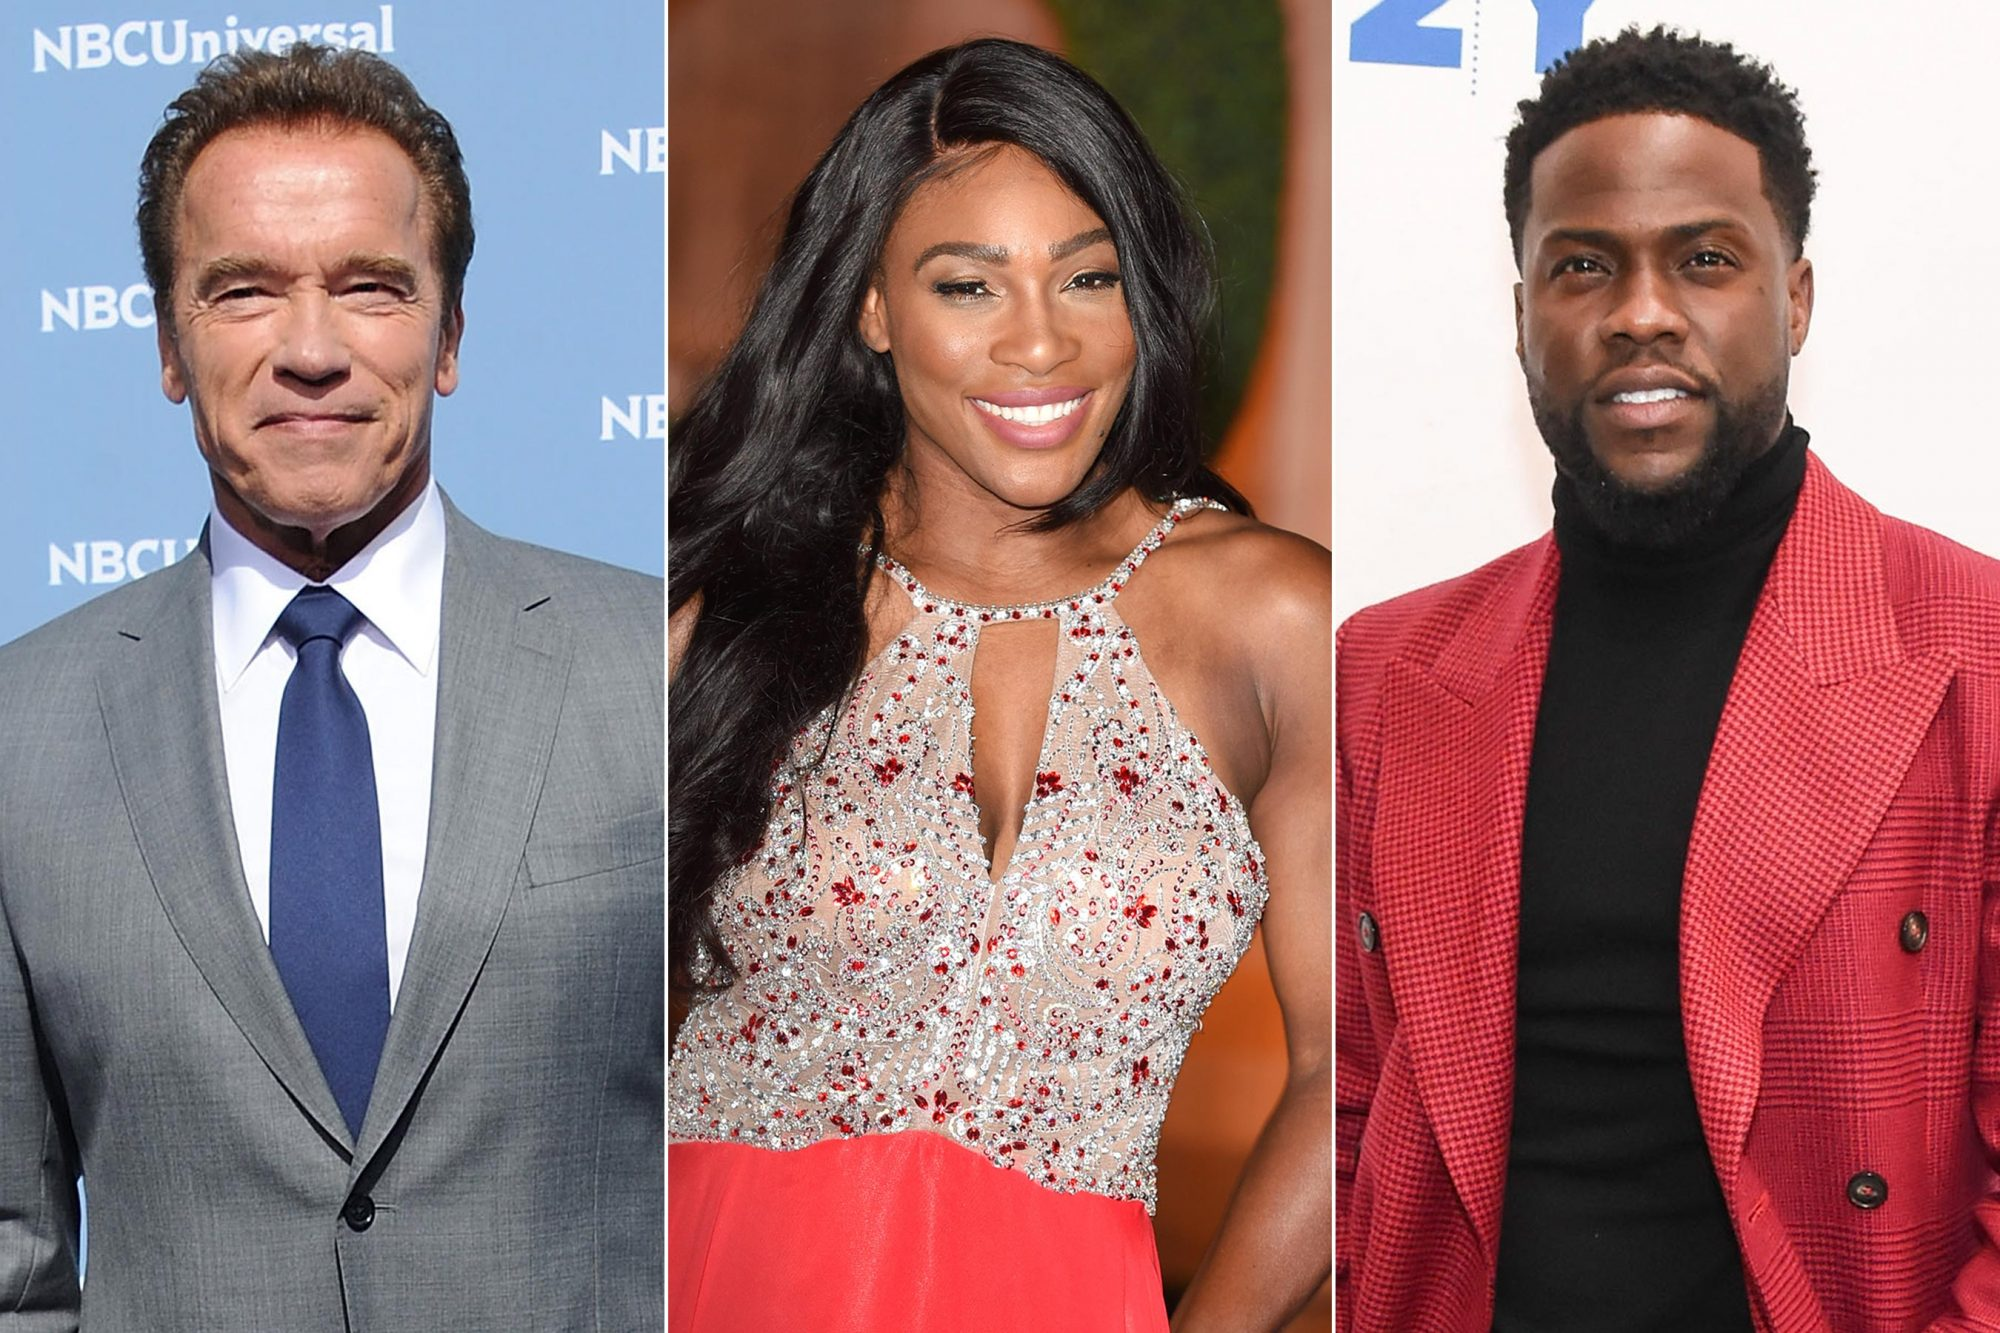 Arnold Schwarzenegger, Serena Williams, Kevin Hart